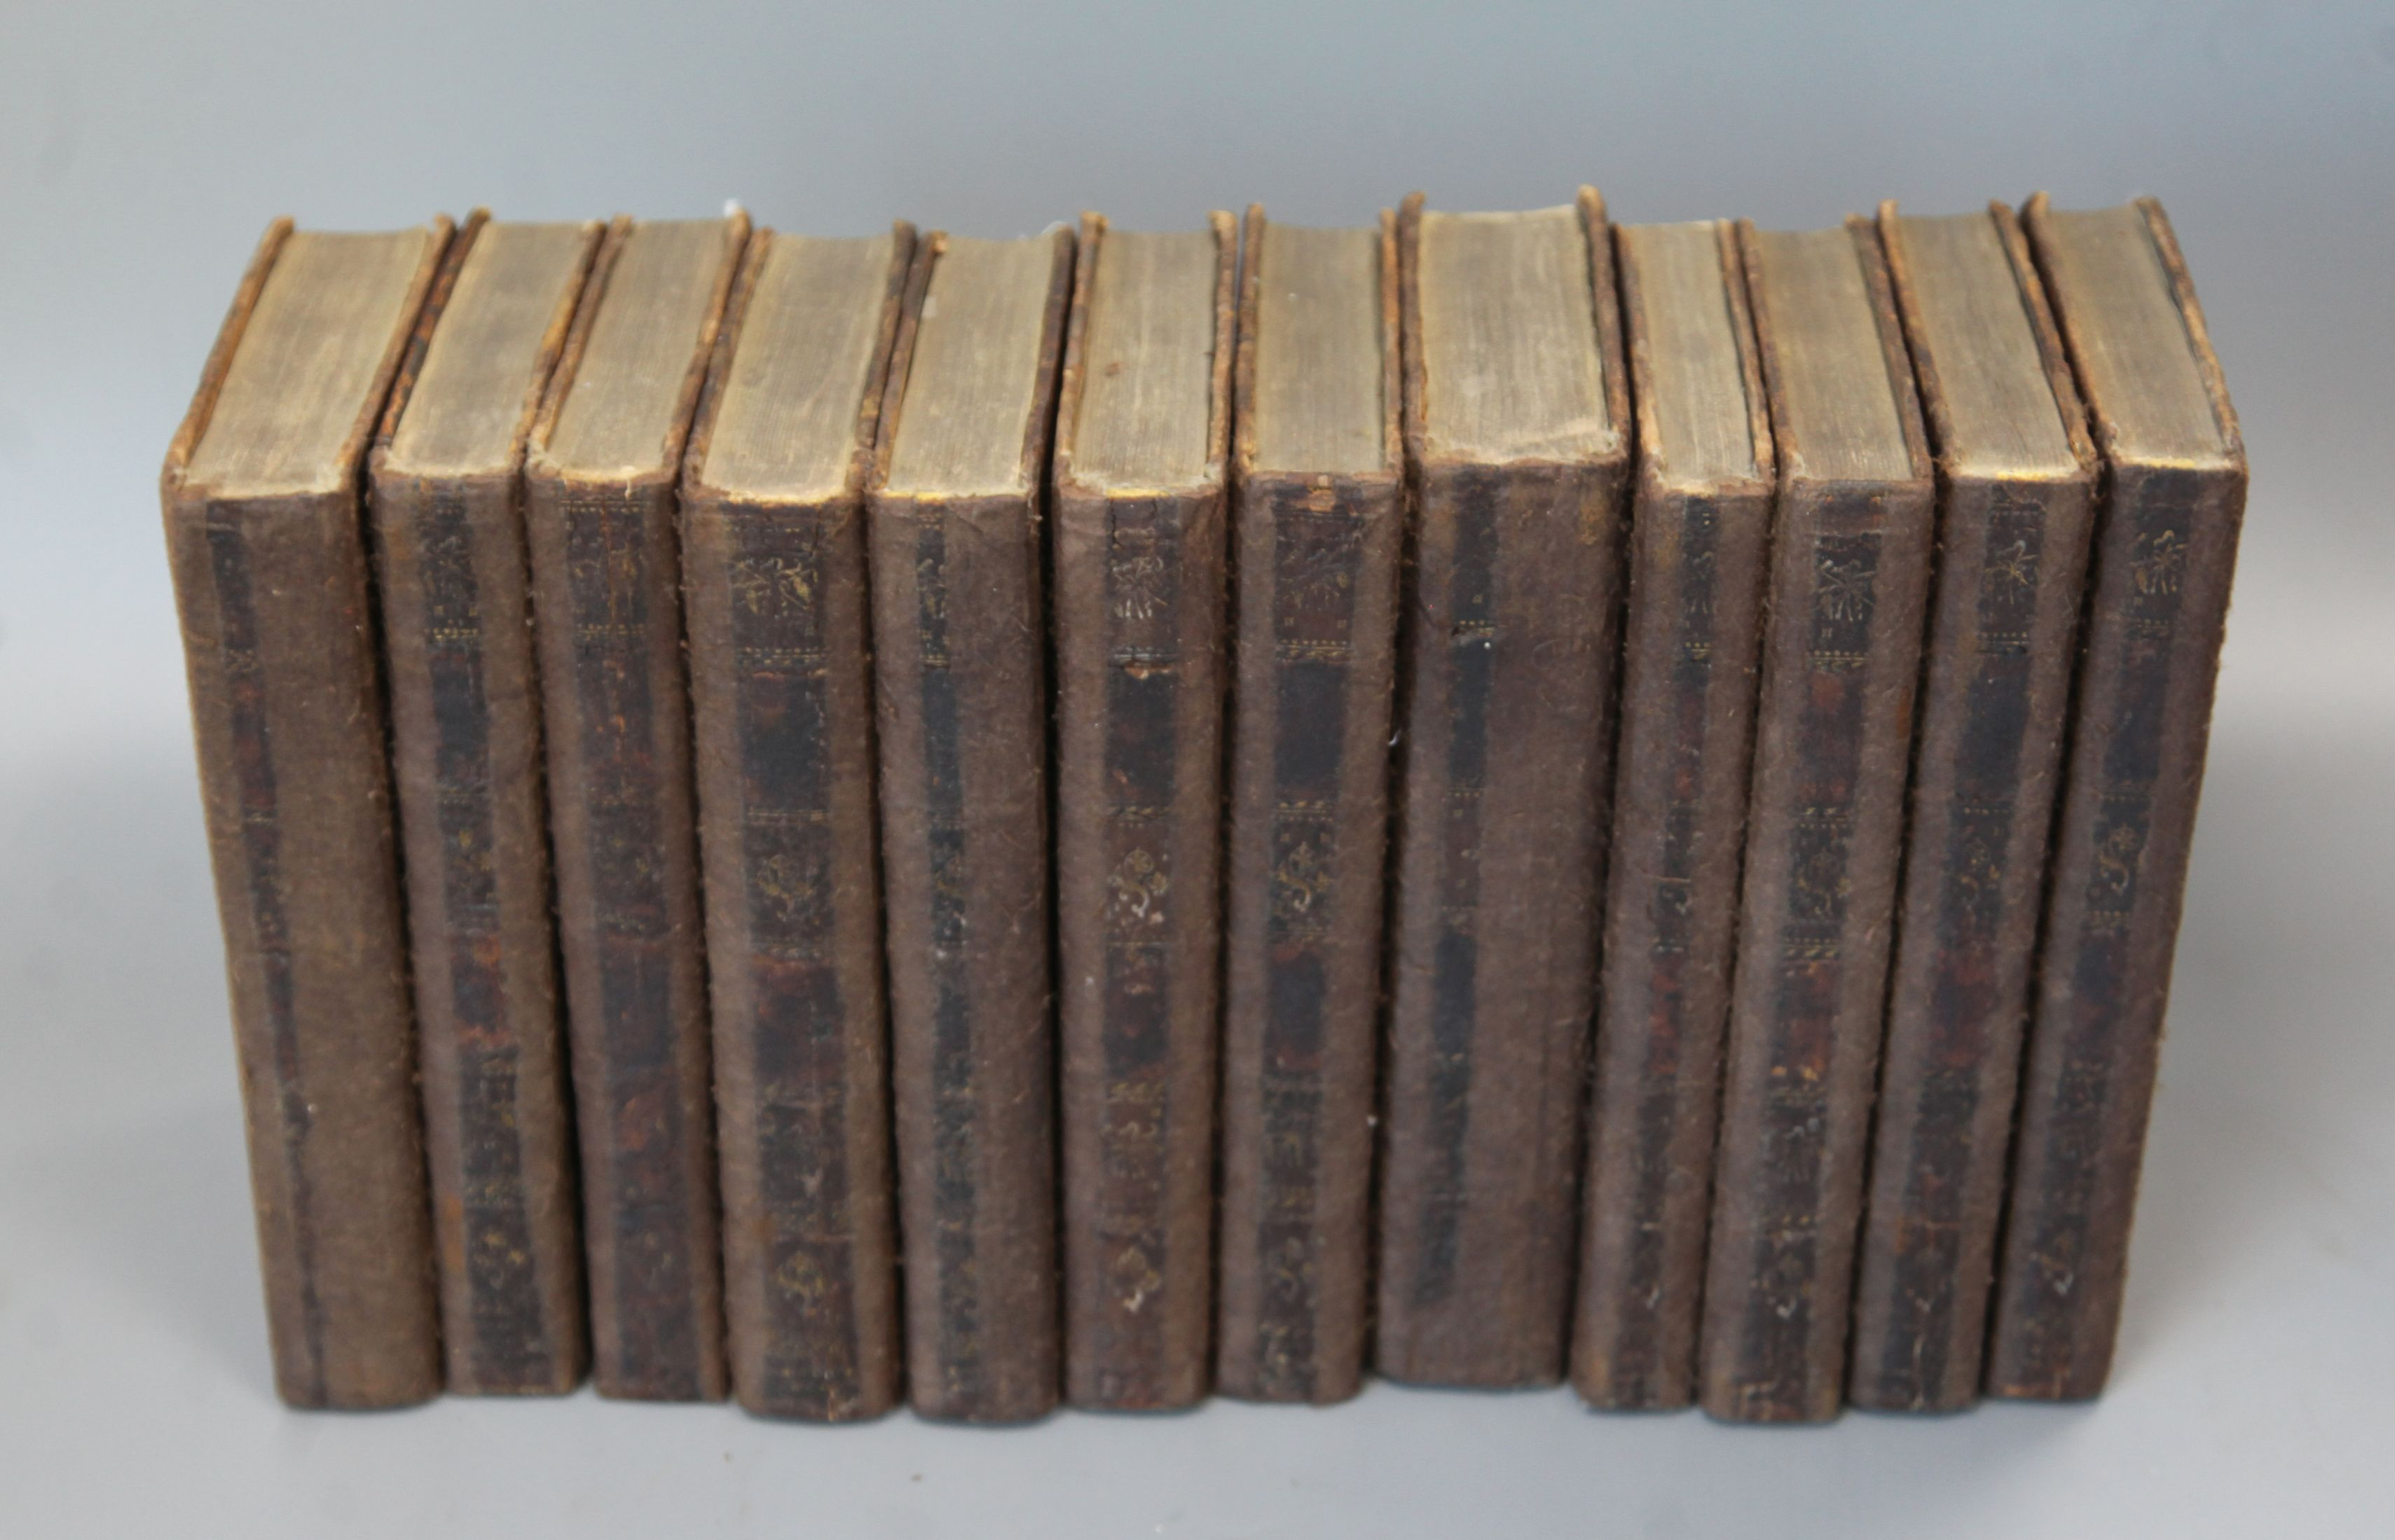 Lot 26 - Swift, Jonathan - Works, 12 vols, edited by John Hawkesworth, tree calf, restored, London 1755